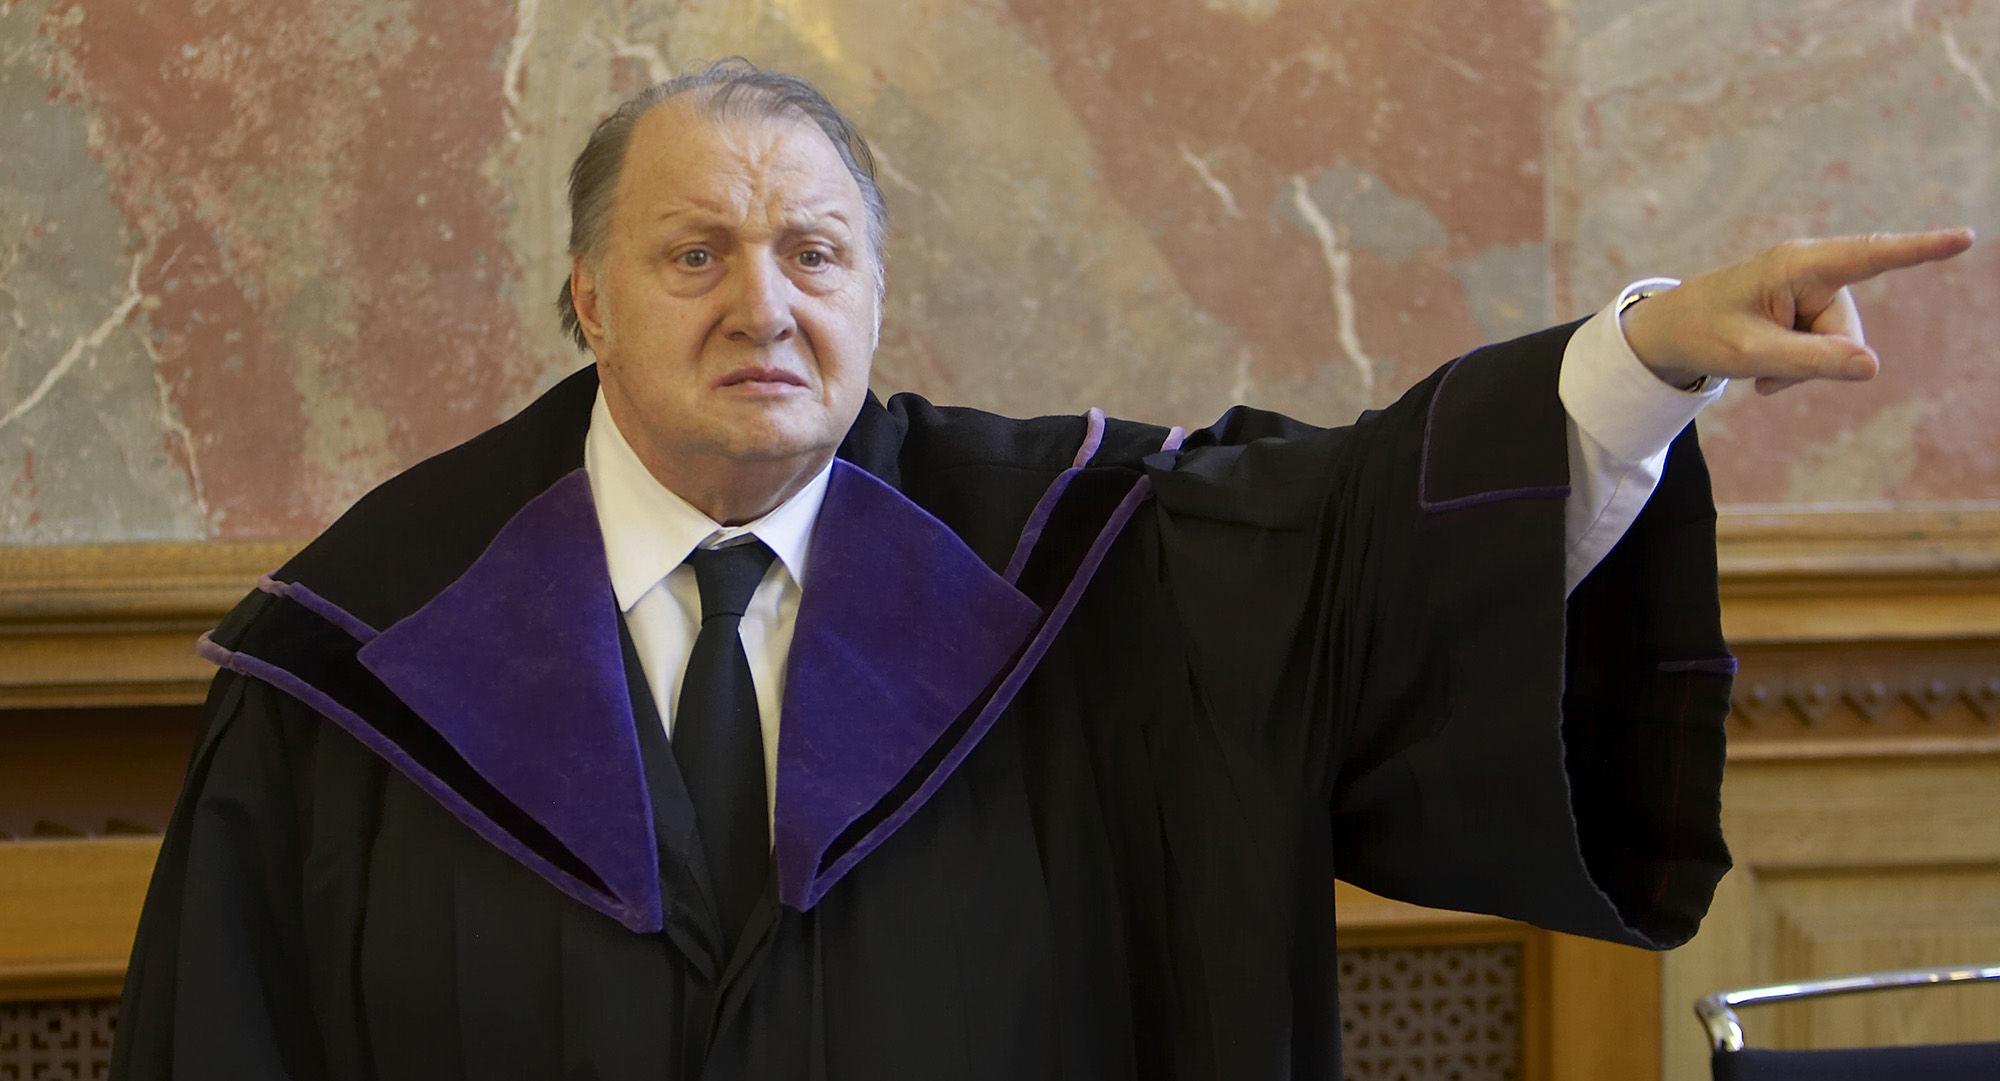 Herbert Prikopa (Richter)